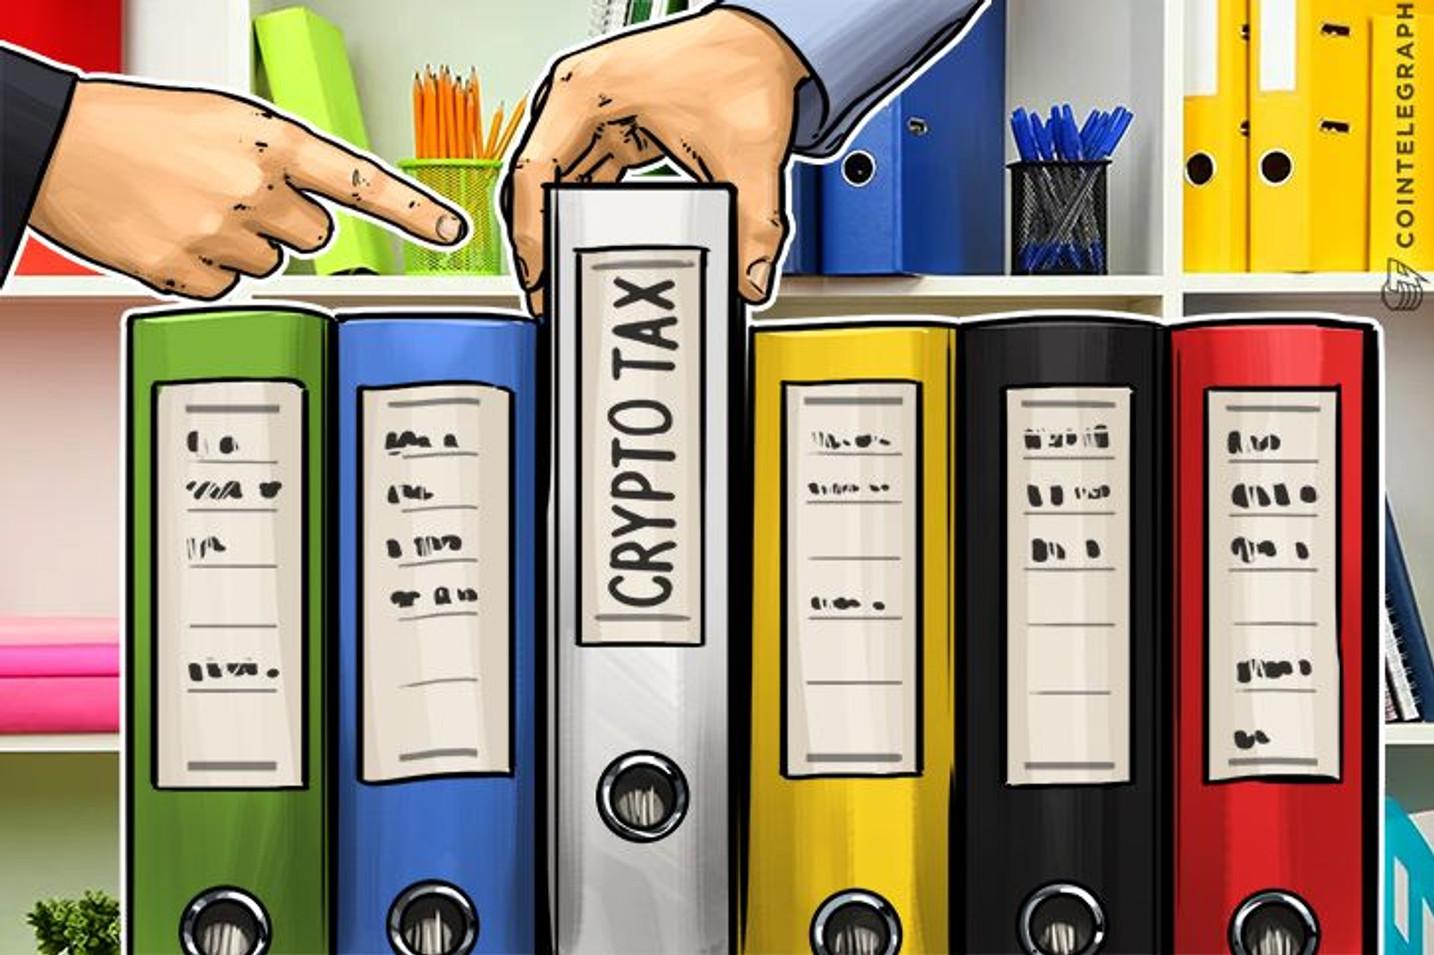 Thailand Delivers First Draft Of 'Digital Asset' Regulations